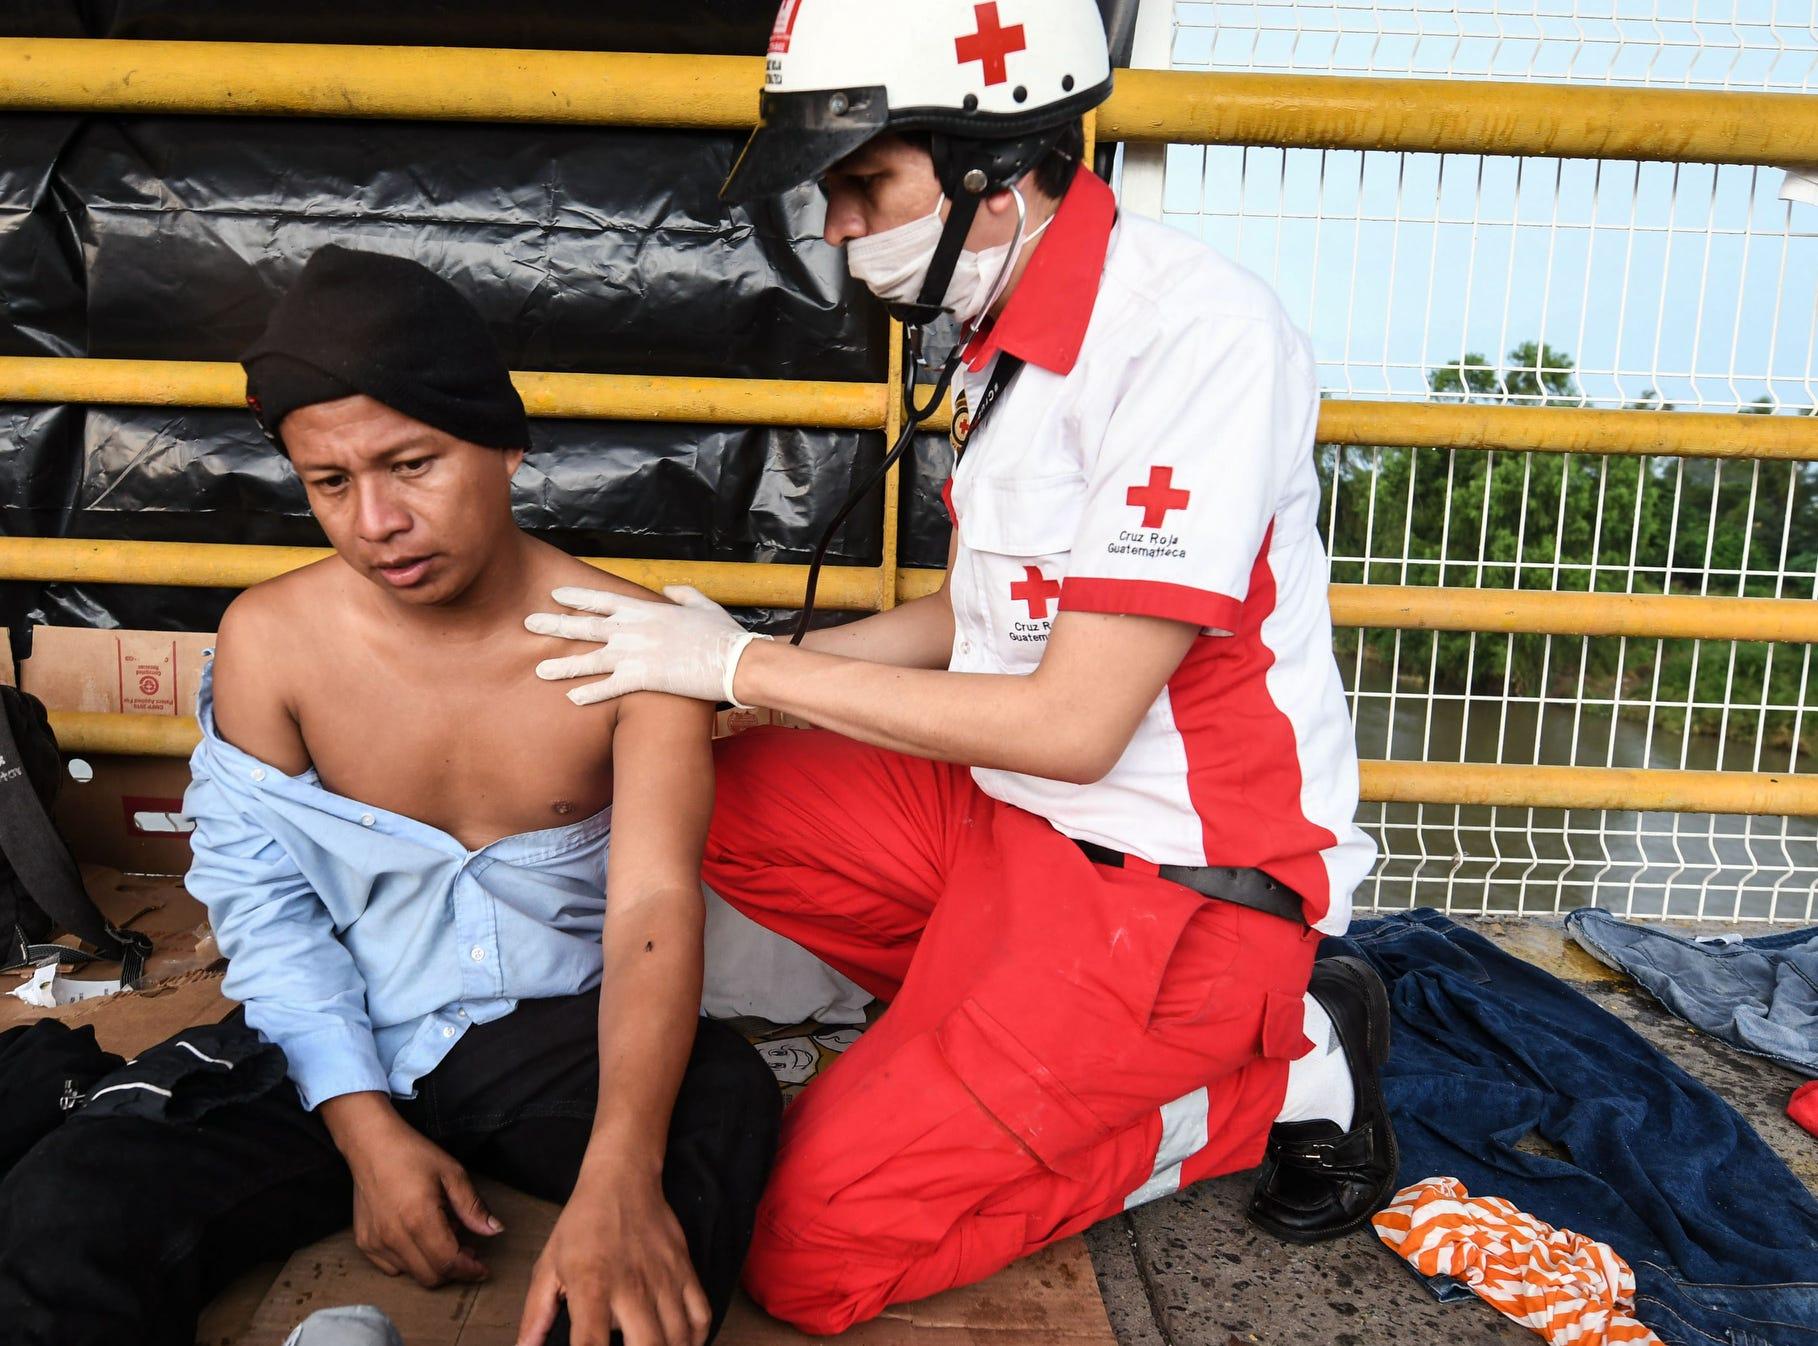 A member of the Guatemalan Red Cross attends an Honduran migrant heading in a caravan to de US, in Ciudad Tecun Uman, Guatemala.